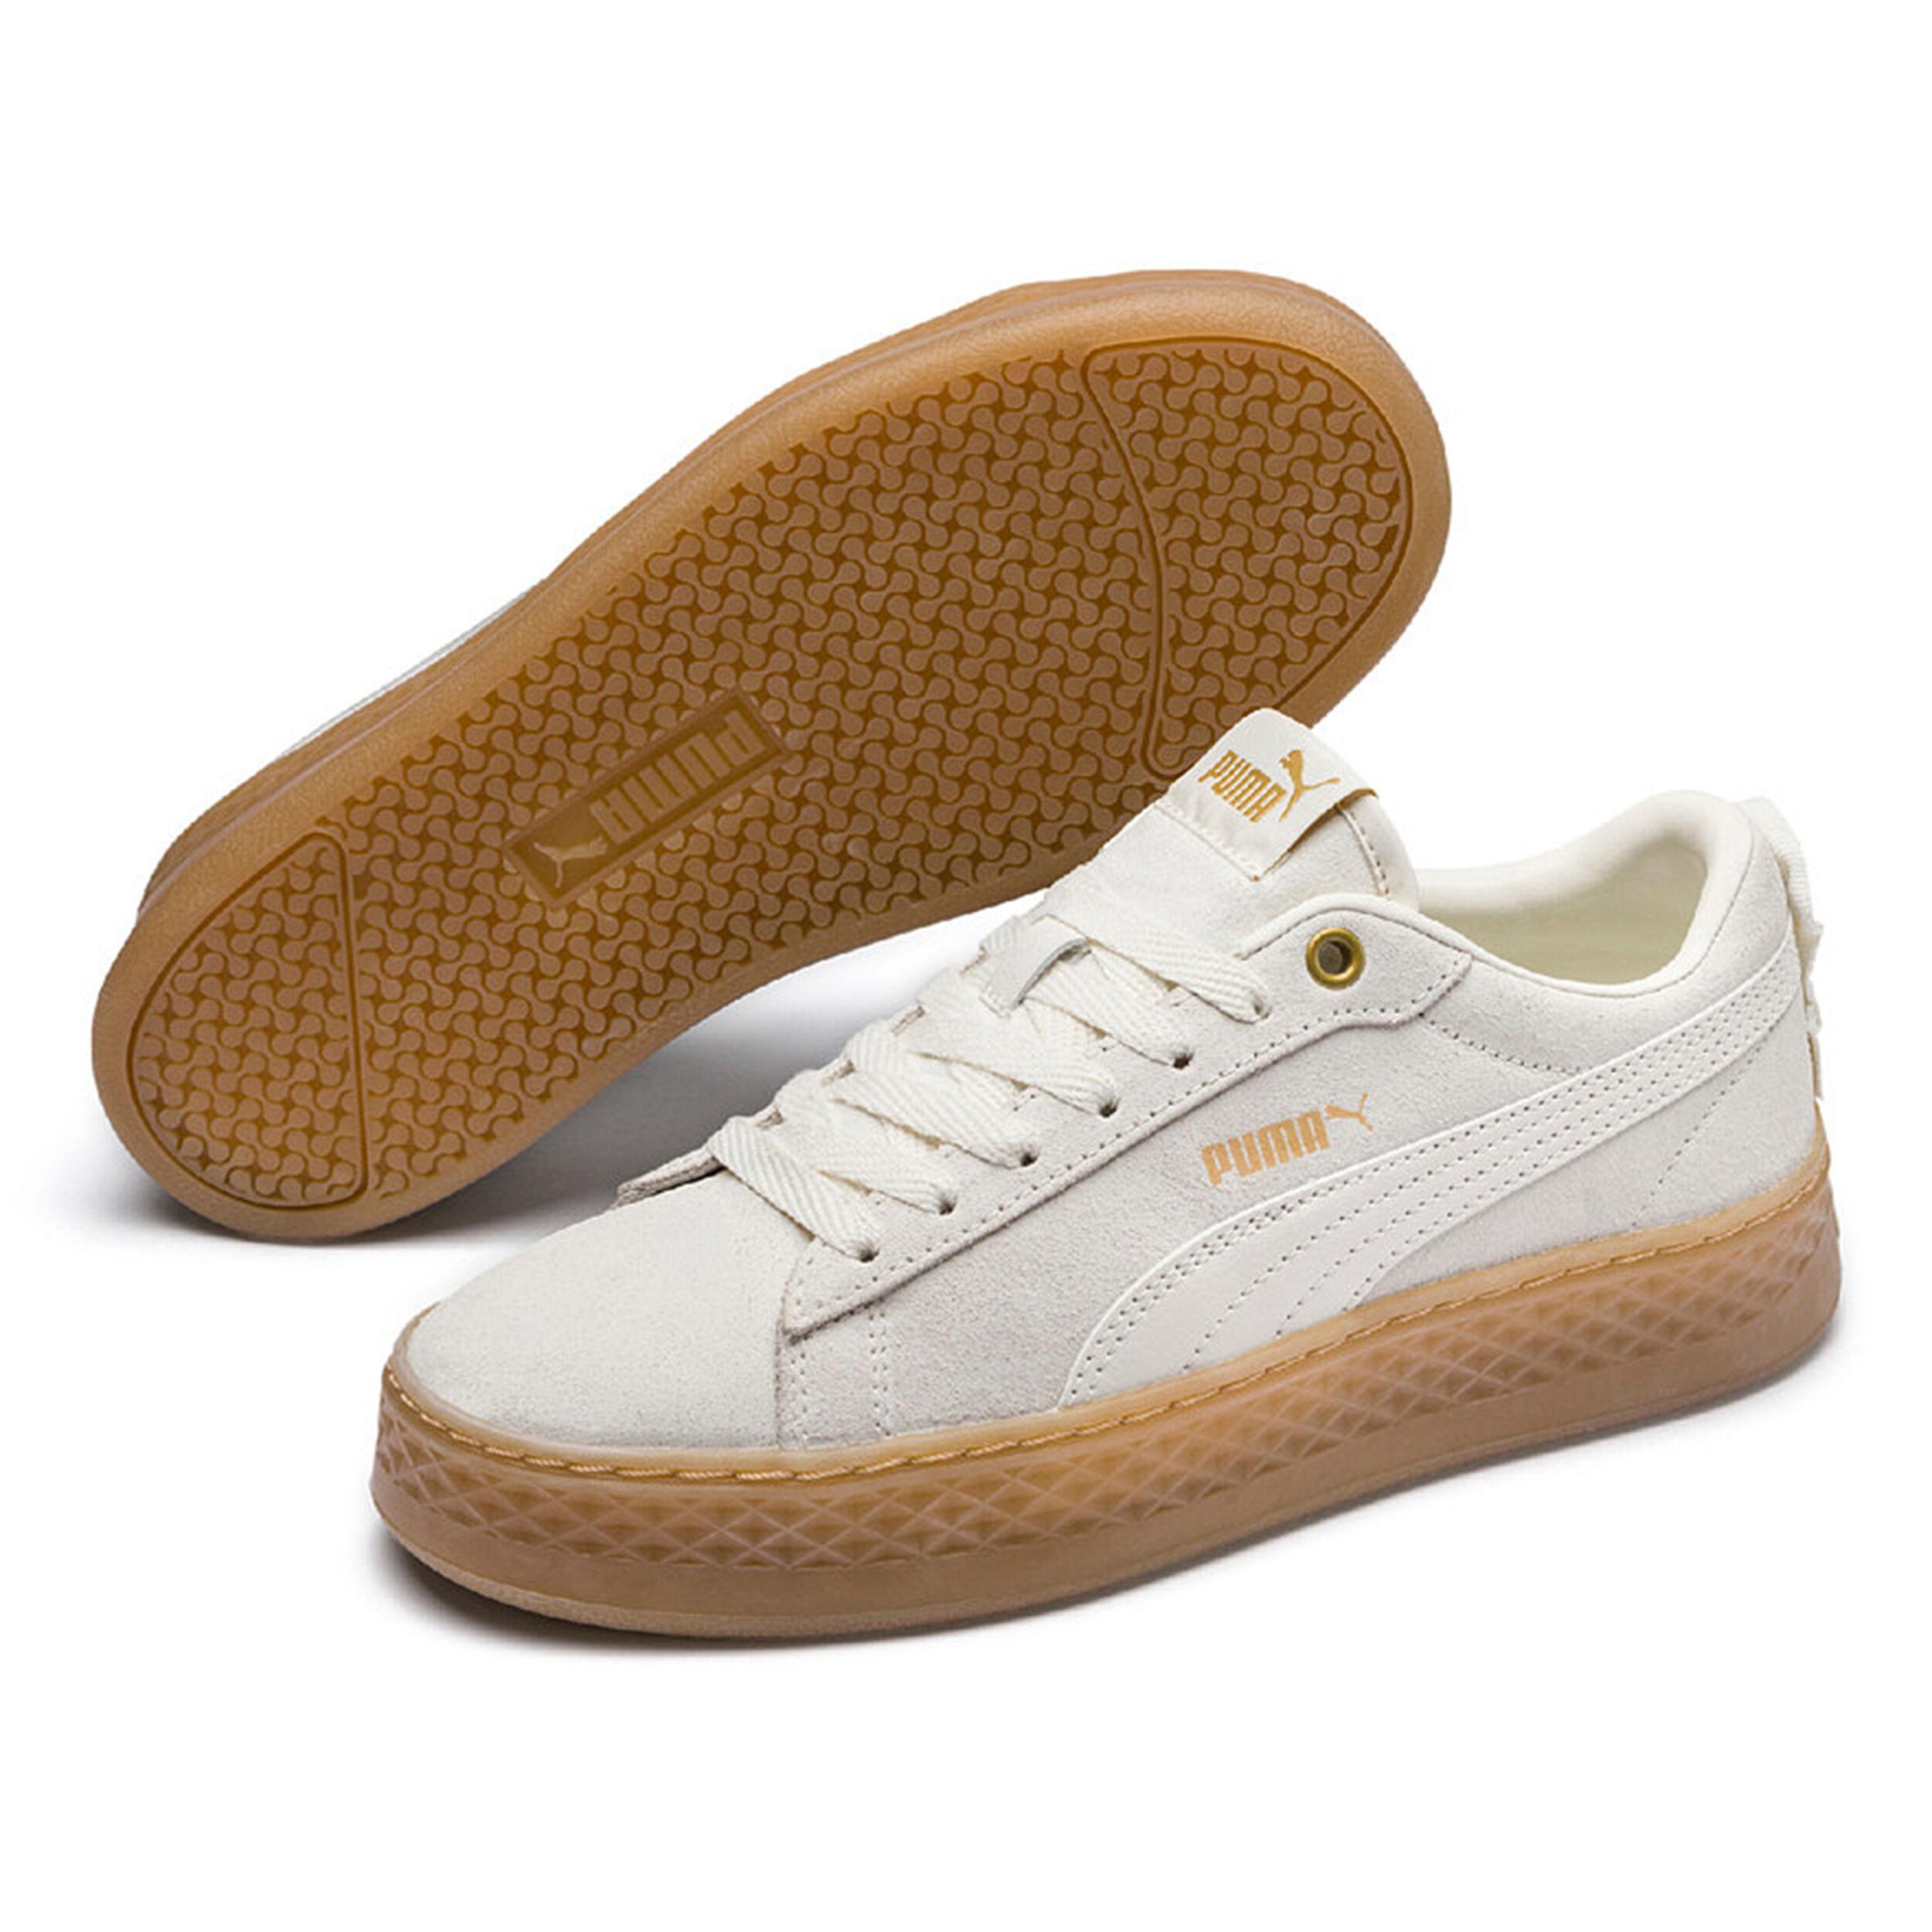 buy Puma Smash Platform Frill Sneakers